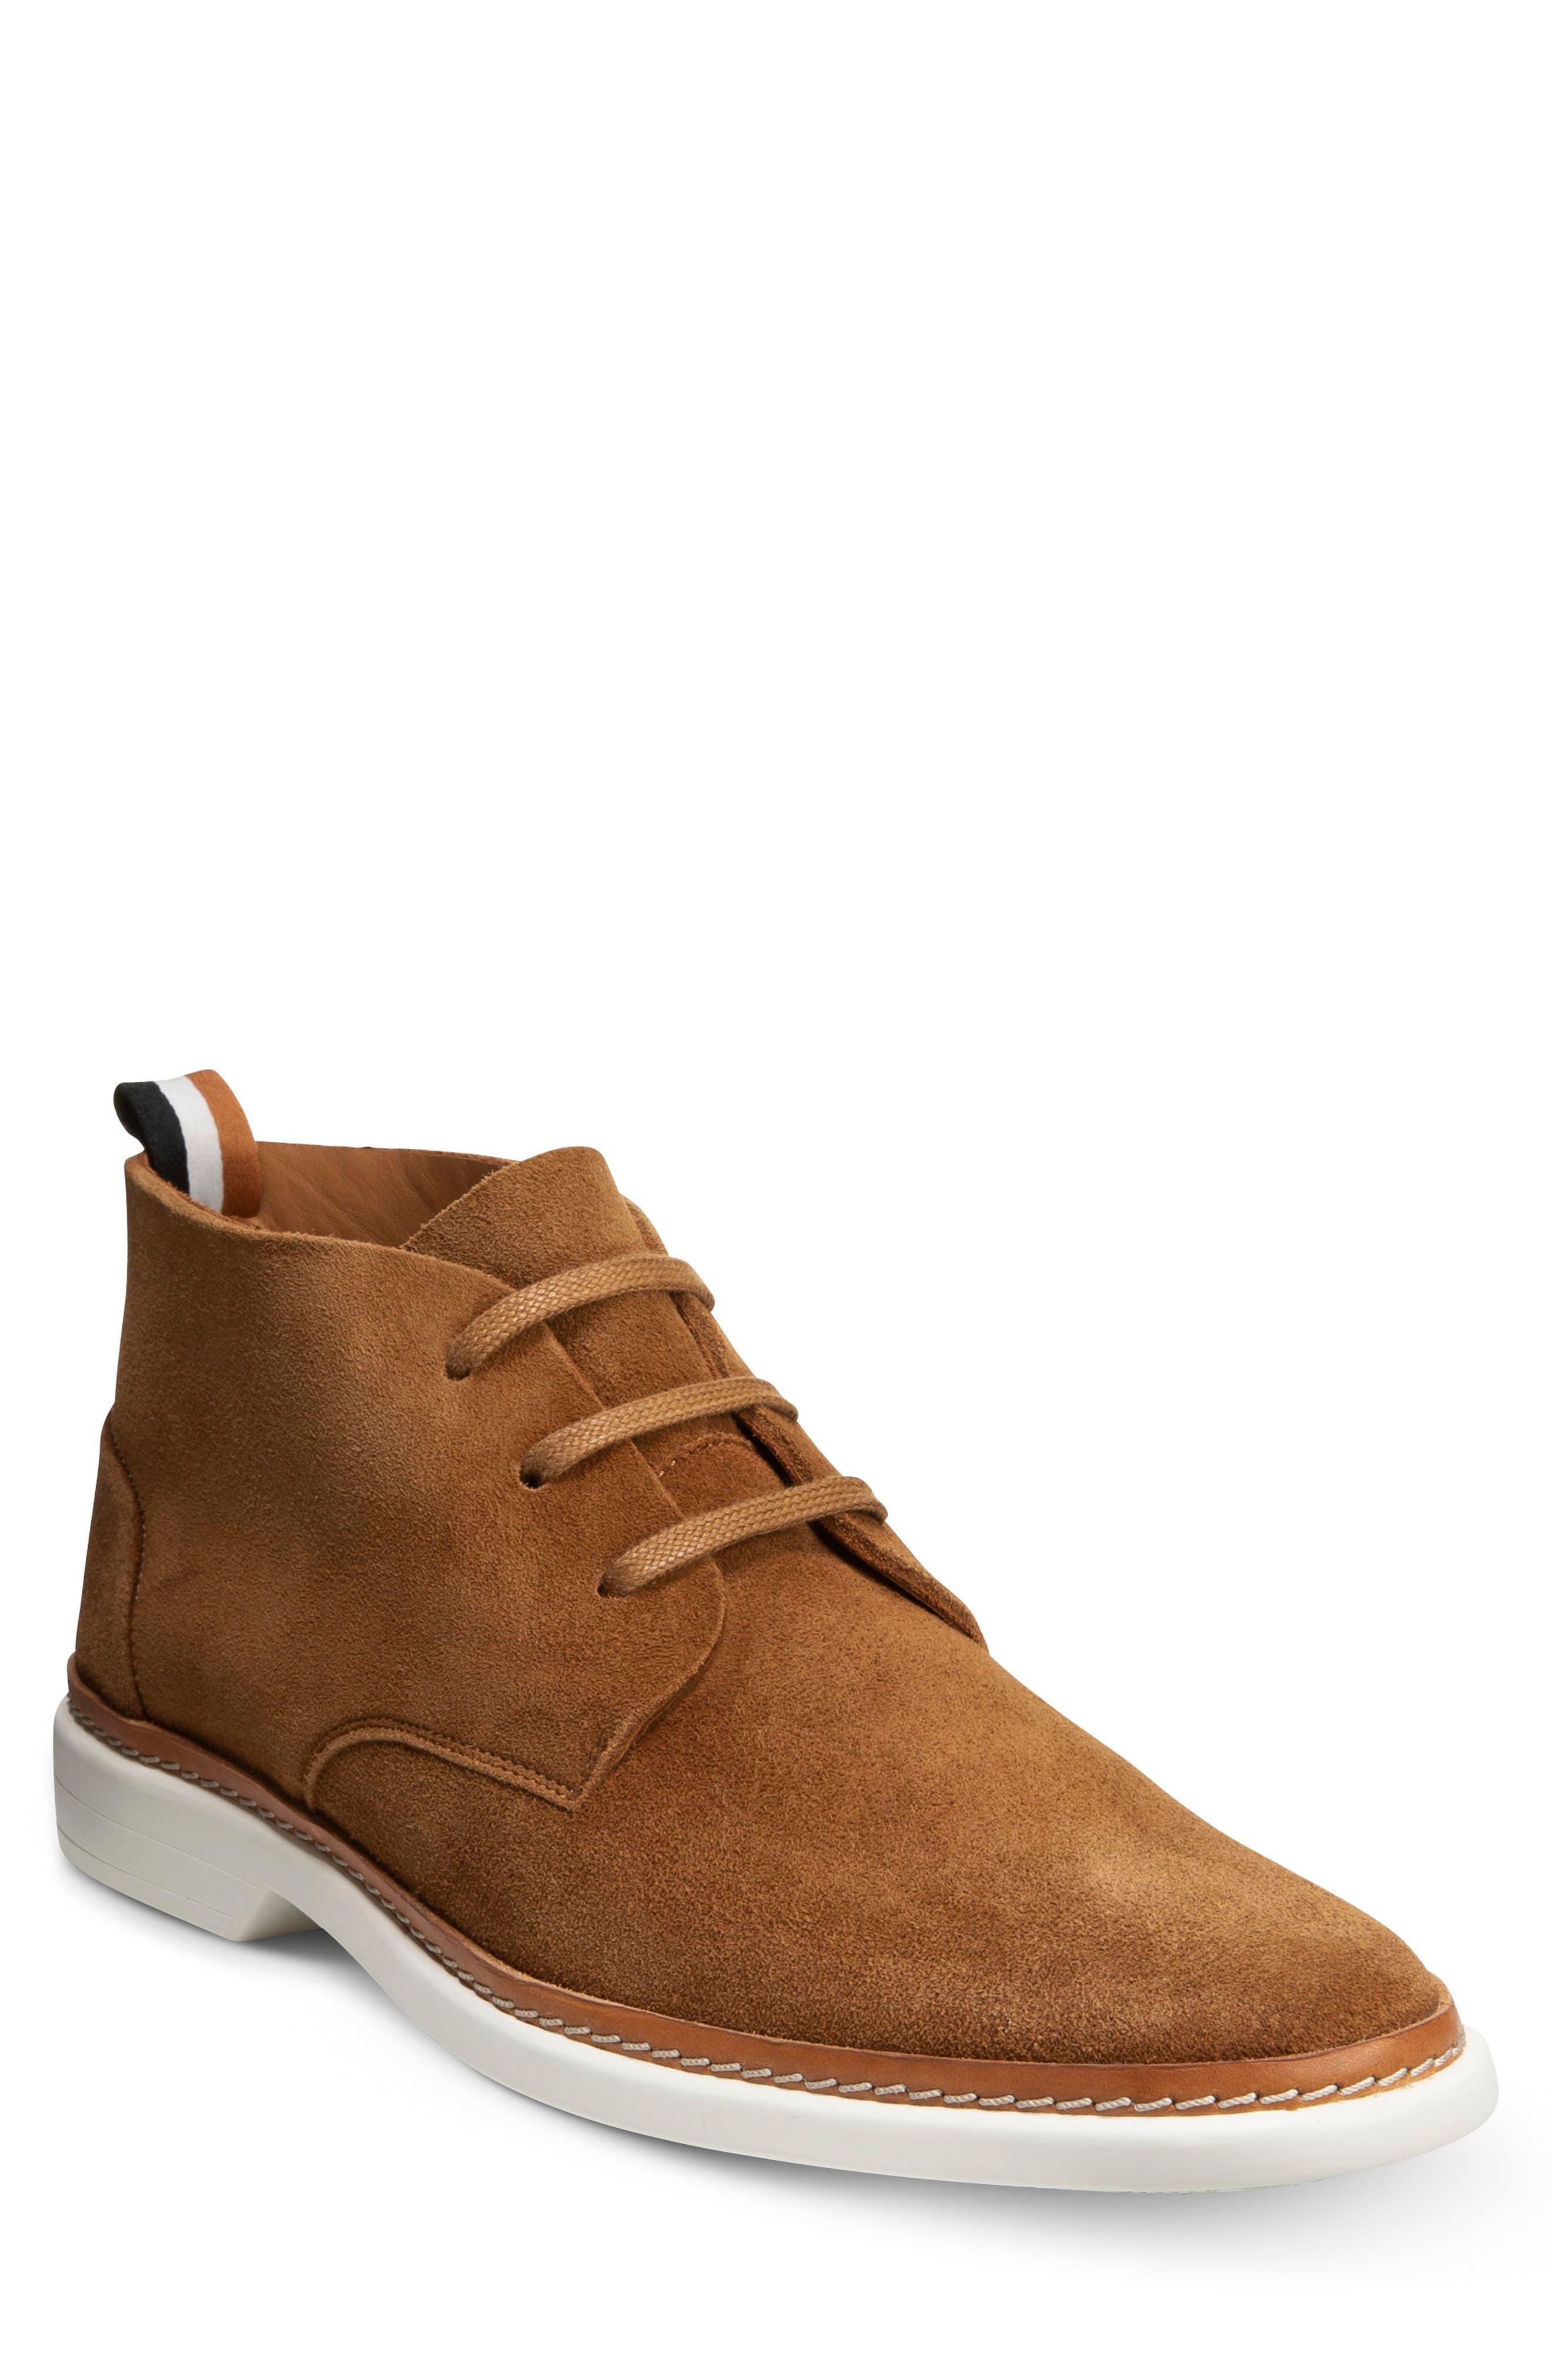 Wilder Chukka Boot